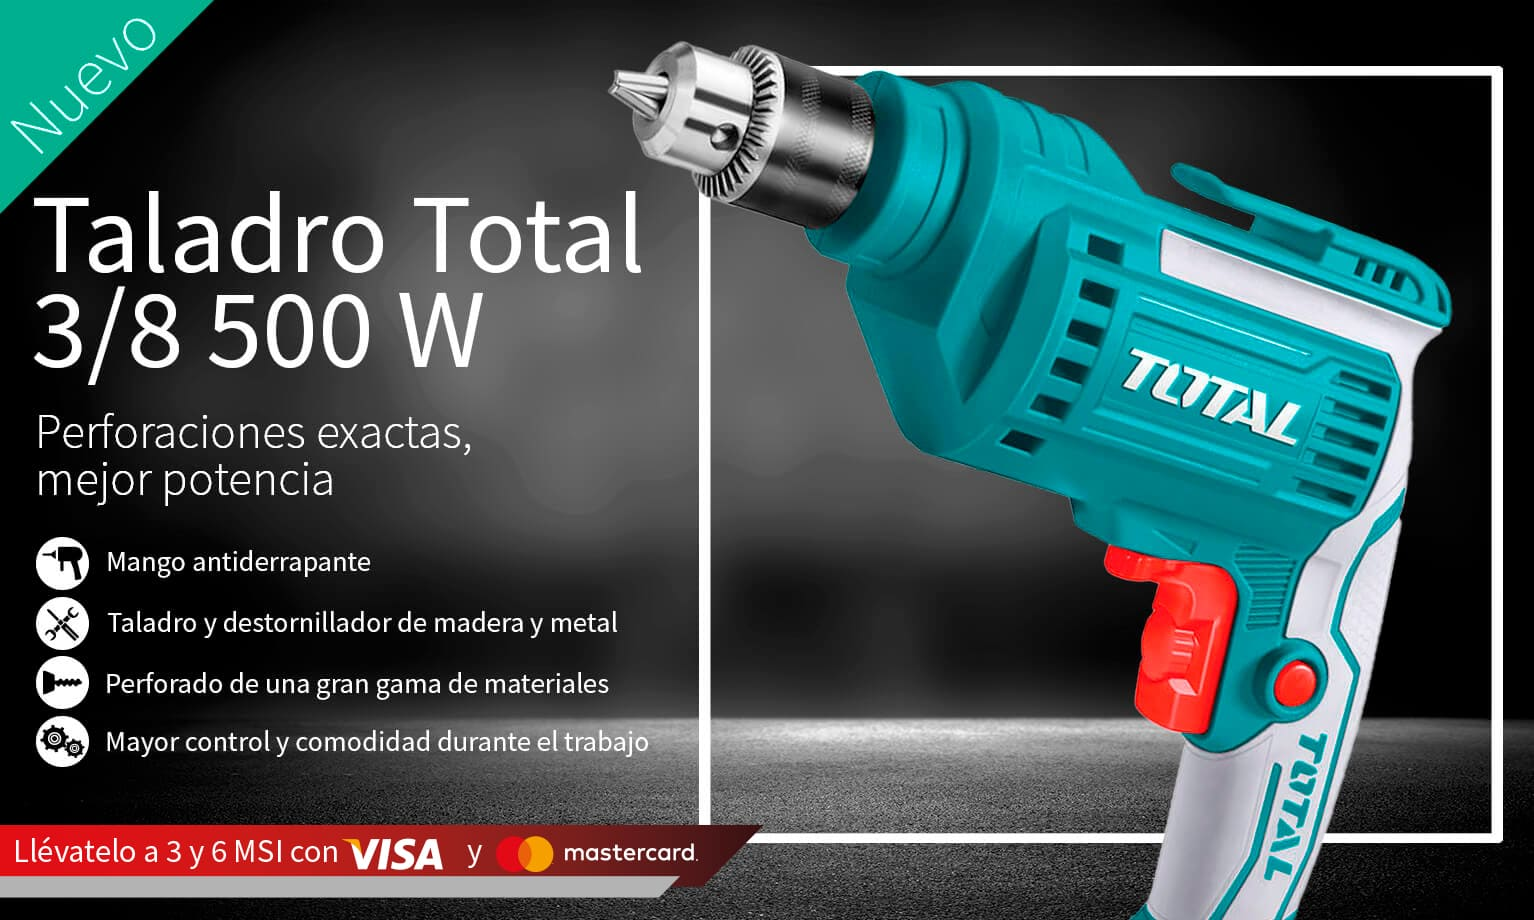 Taladro Total 3/8 500W con 3 o 6 MSI